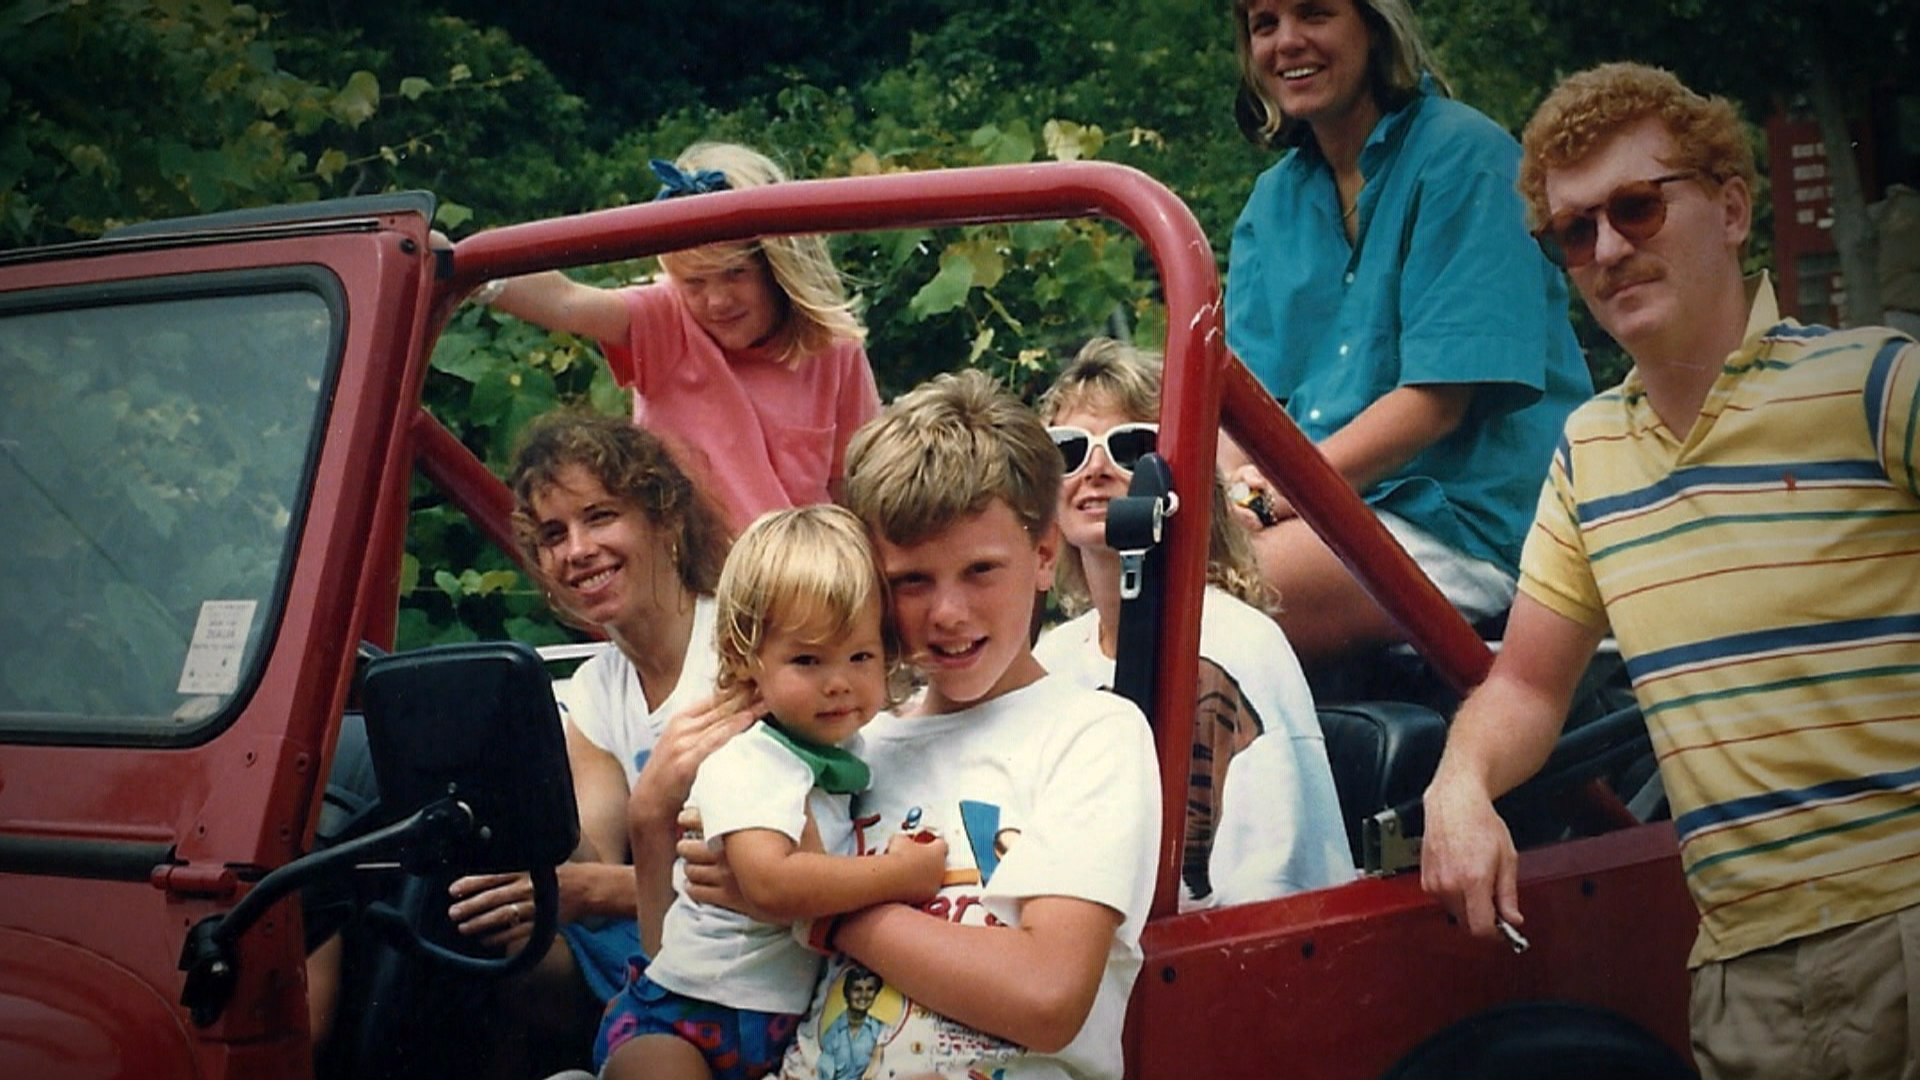 Willie Geist on his father, Bill Geist: 'It's always an adventure with